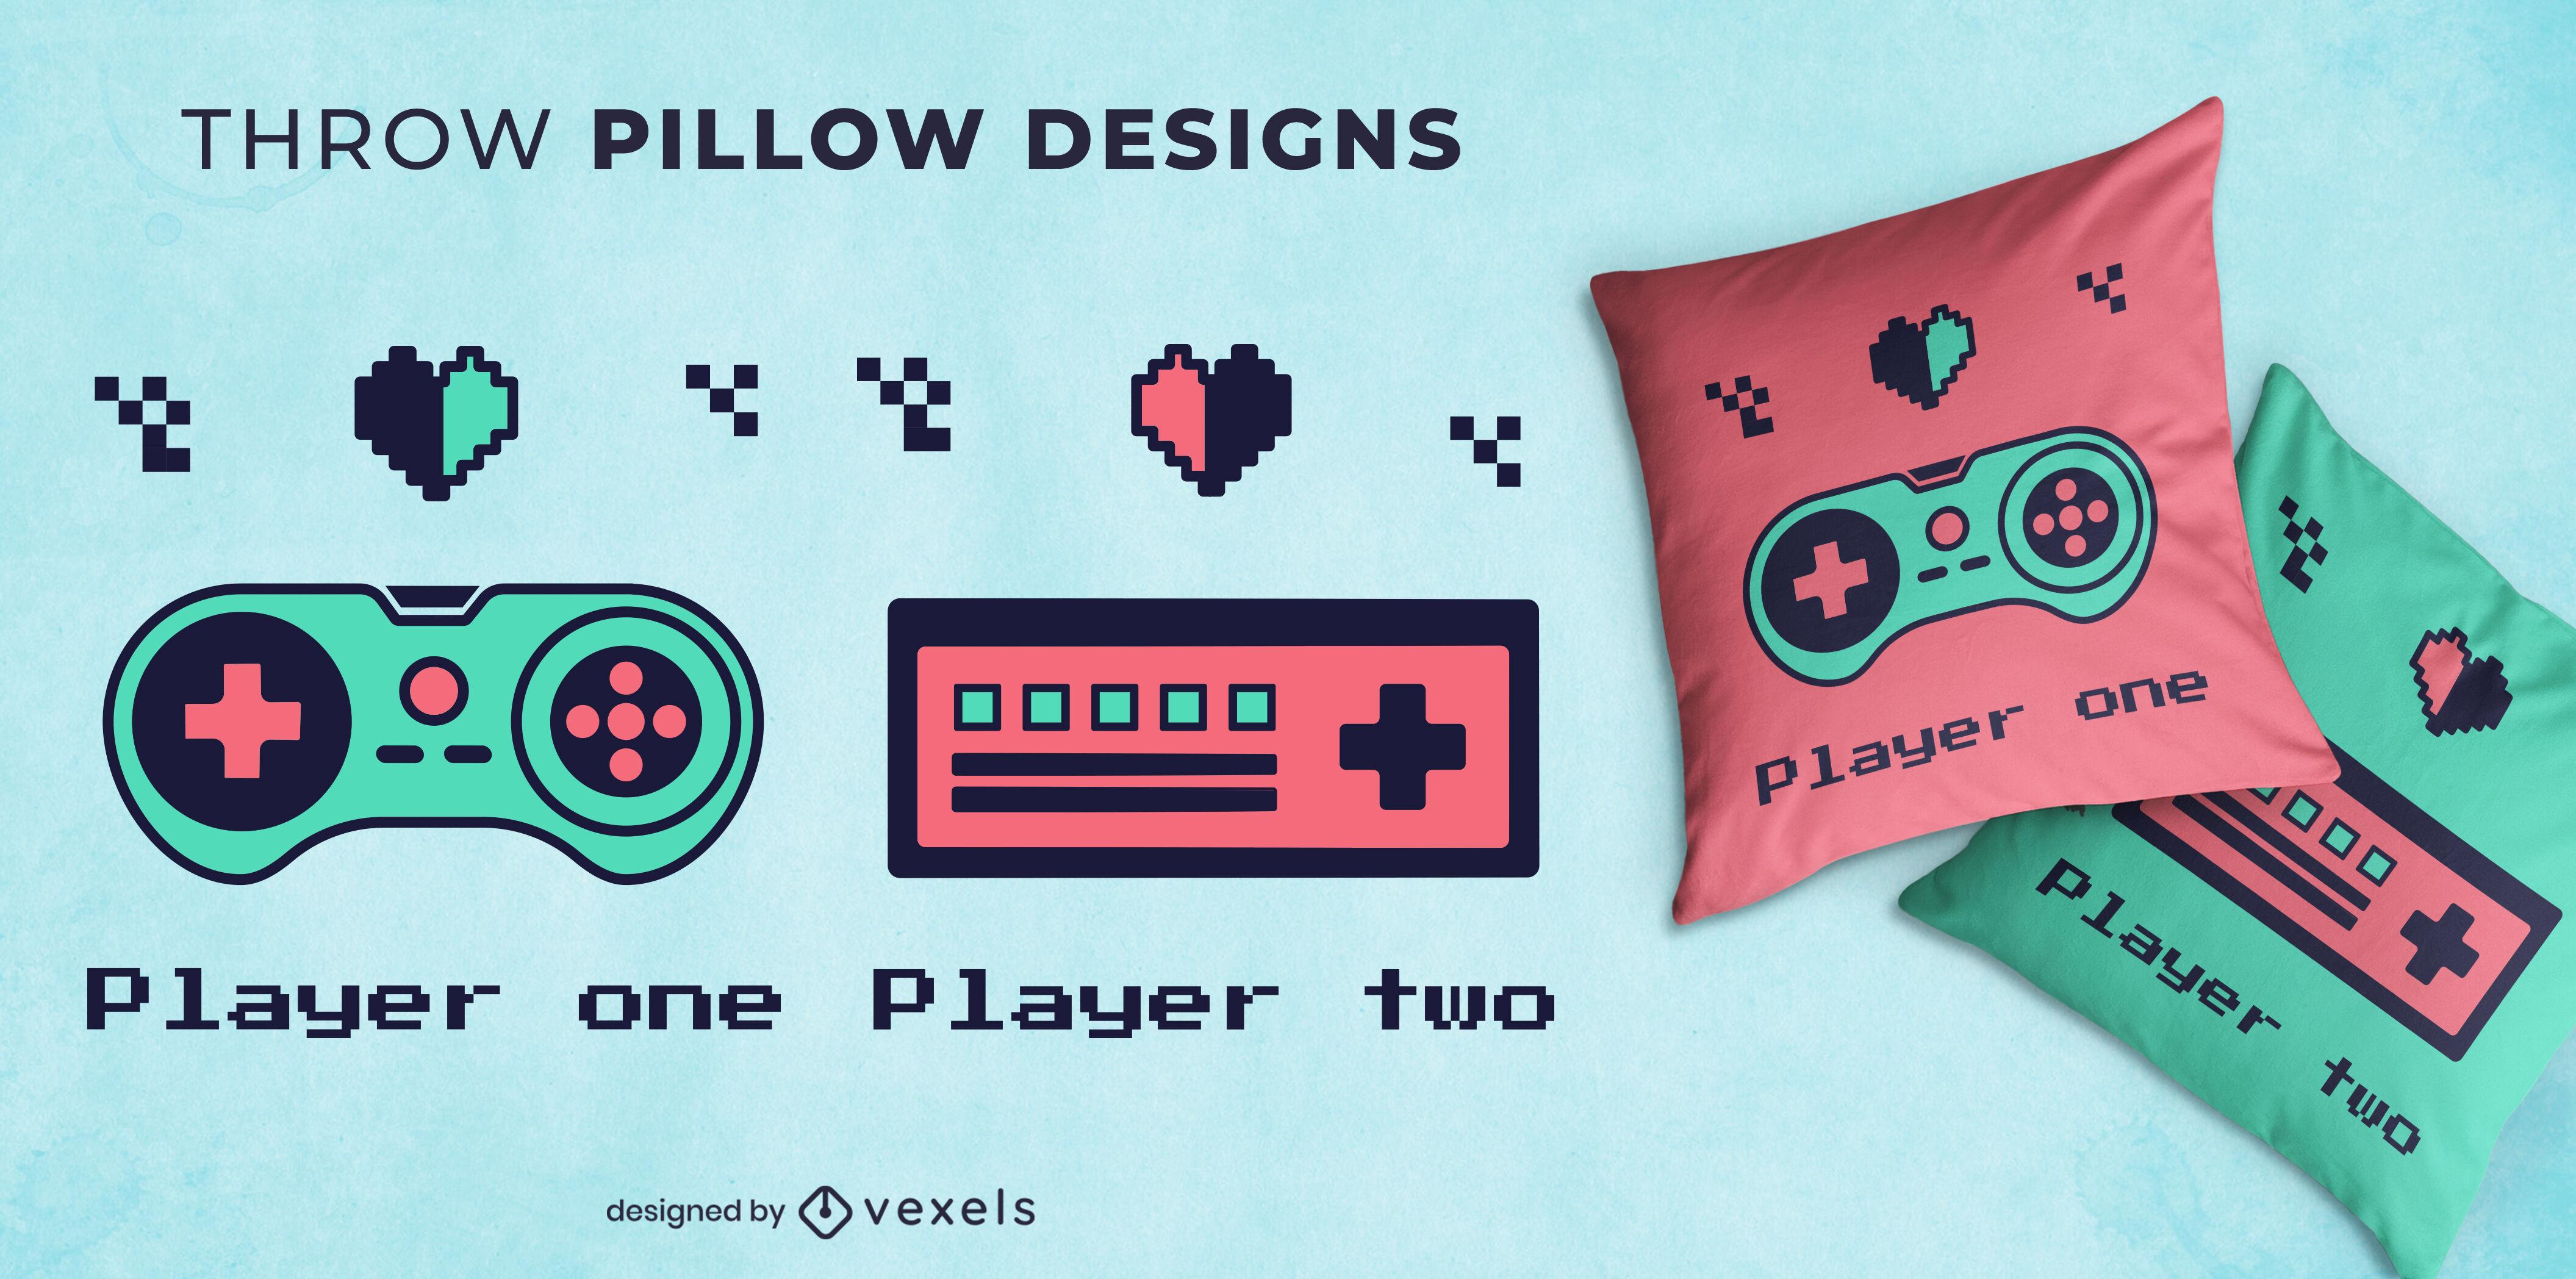 Diseño retro de la almohada del tiro del joystick del jugador